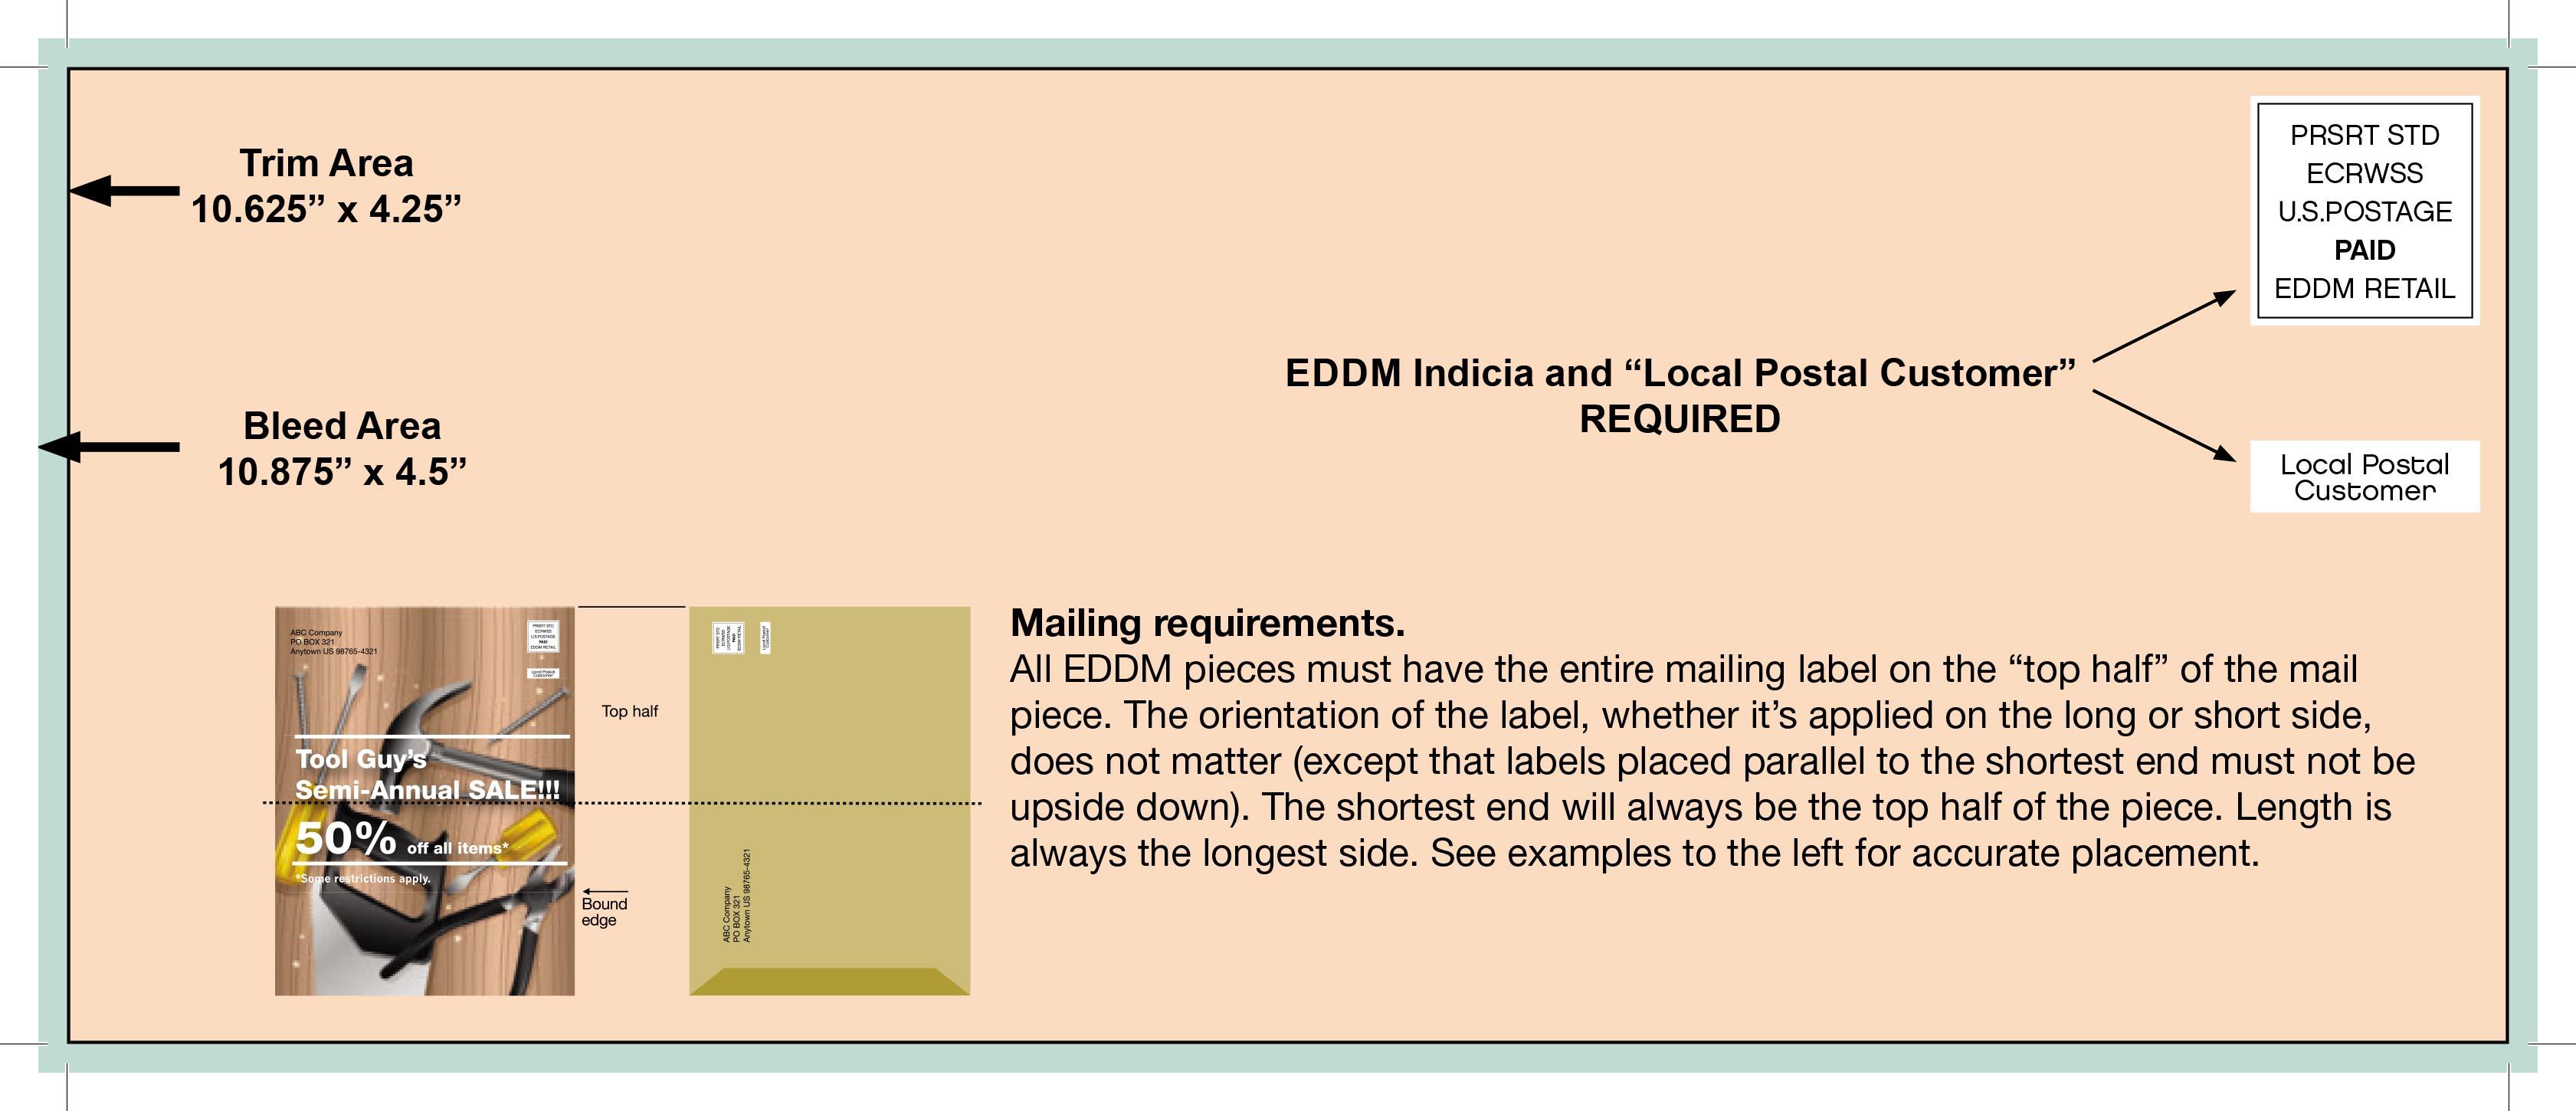 "4.25"" x 10.625"" EDDM"